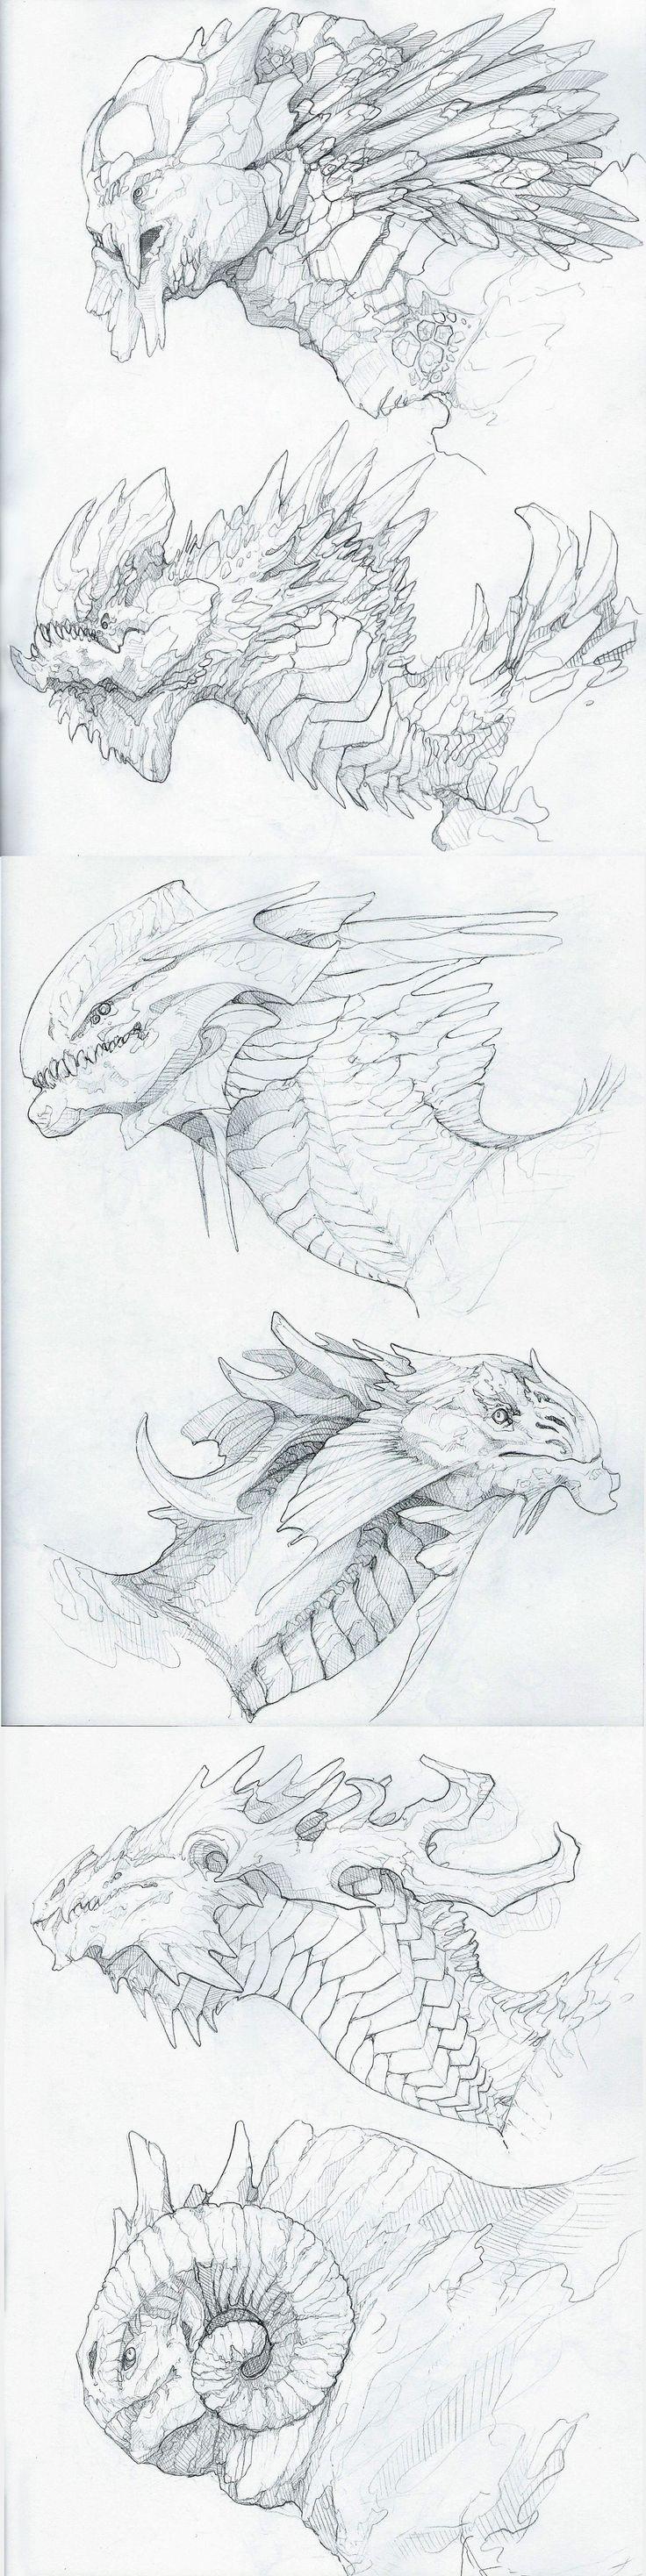 dragon_heads_for_jesse__by_oddosprey-d94ug4v.jpg (1253×5000)